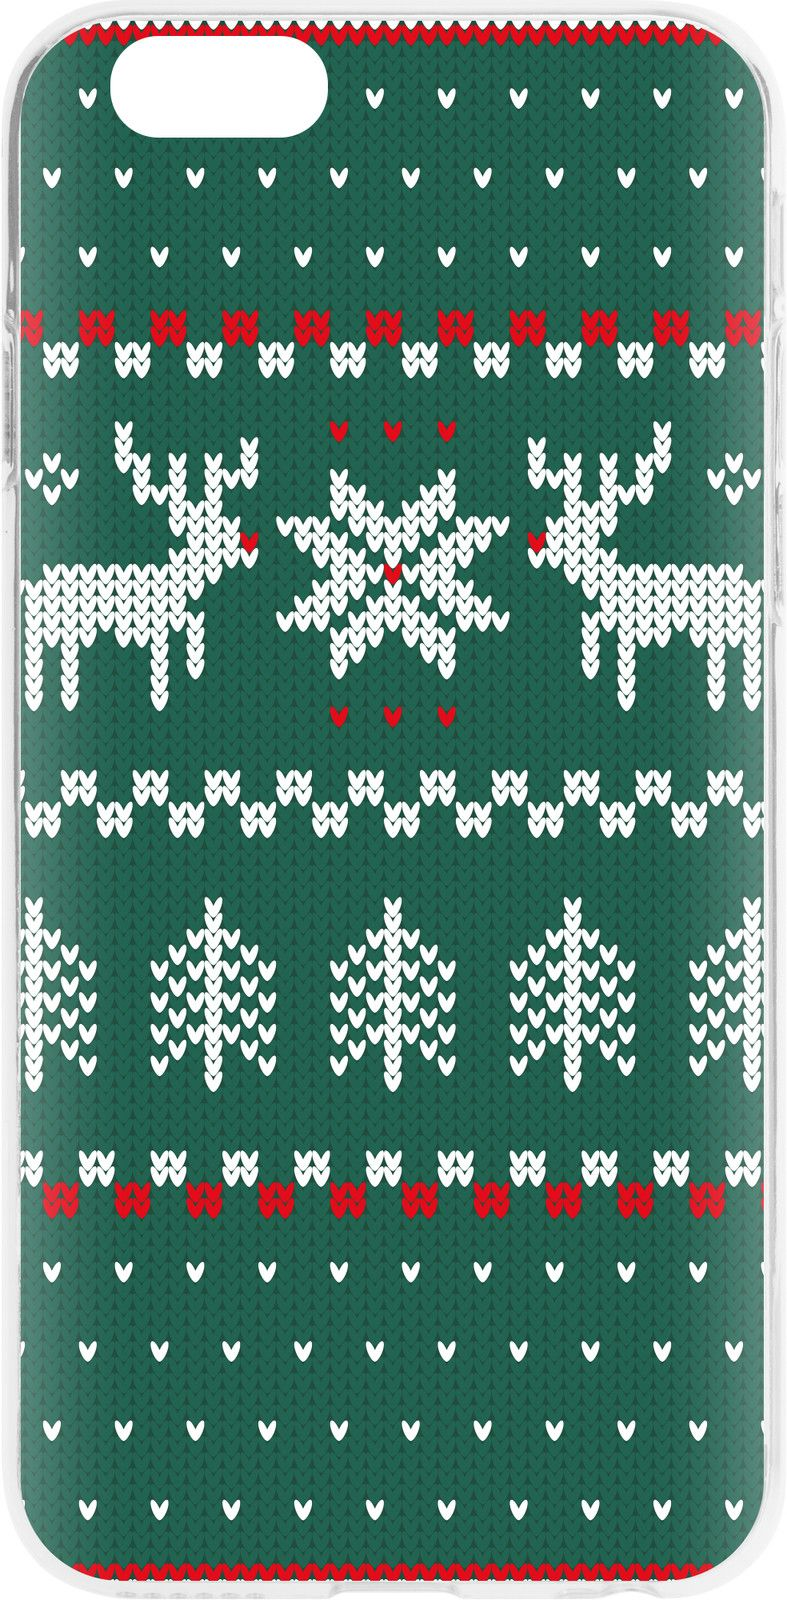 Flavr Xmas Reindeer Sweater (iPhone 6/6S)